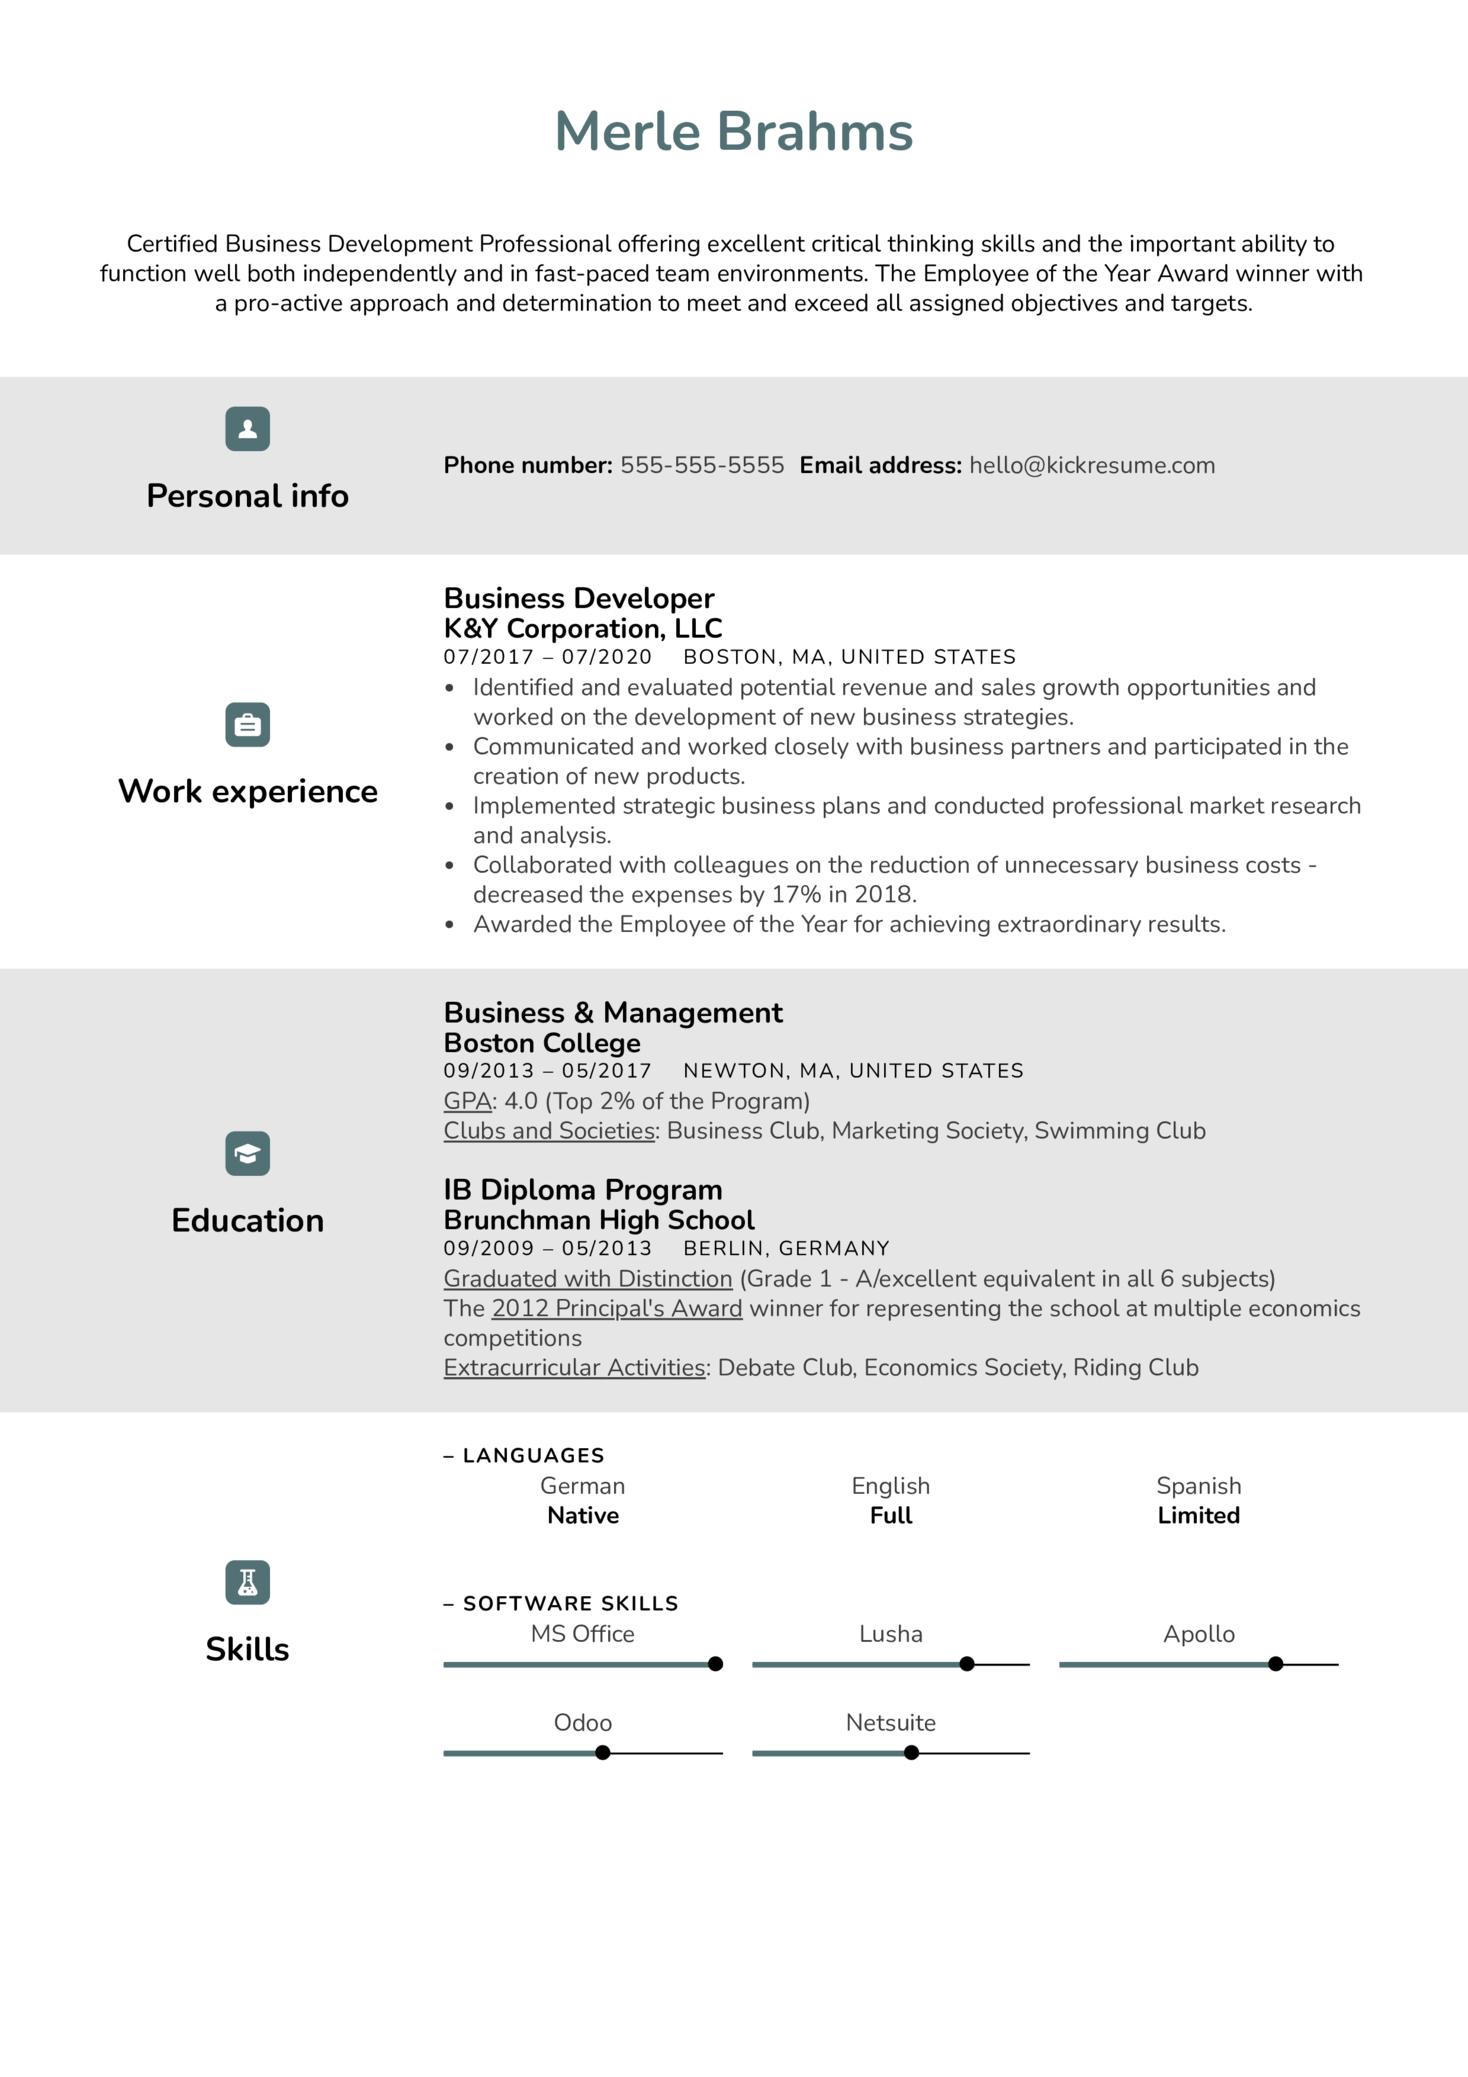 Business Developer Resume Example (Part 1)